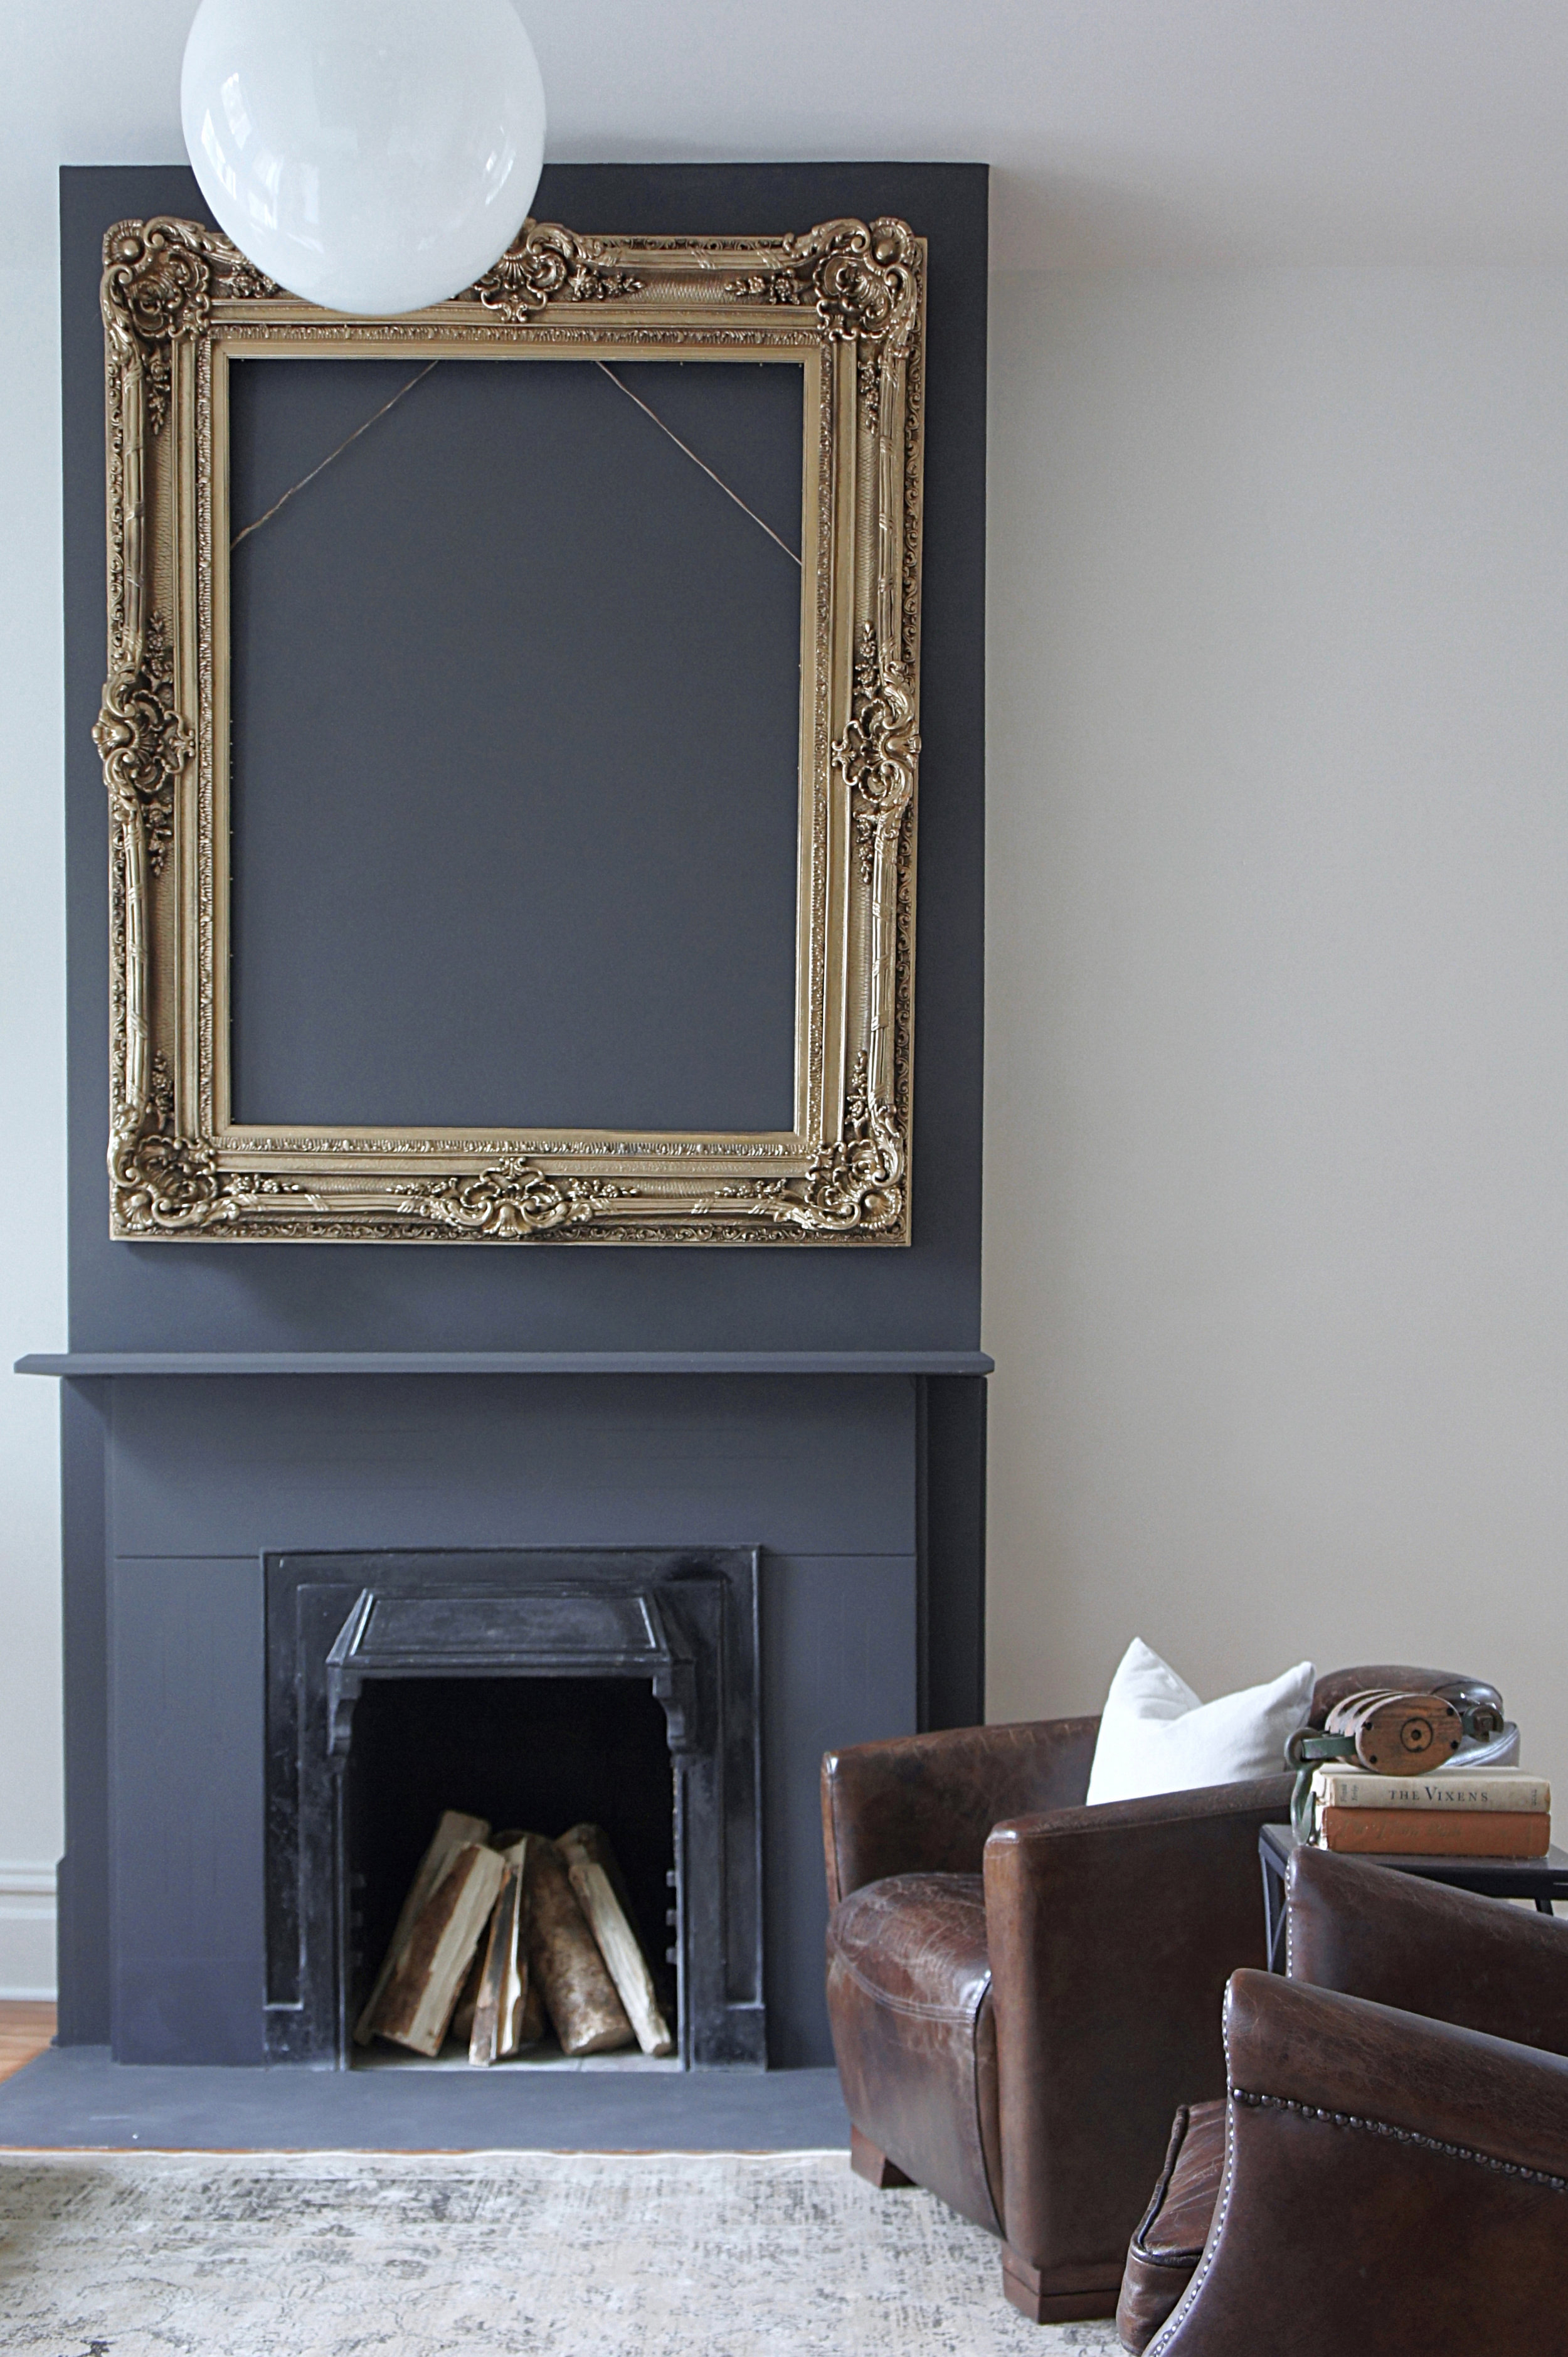 Victorian Fireplace by Kaemingk Design